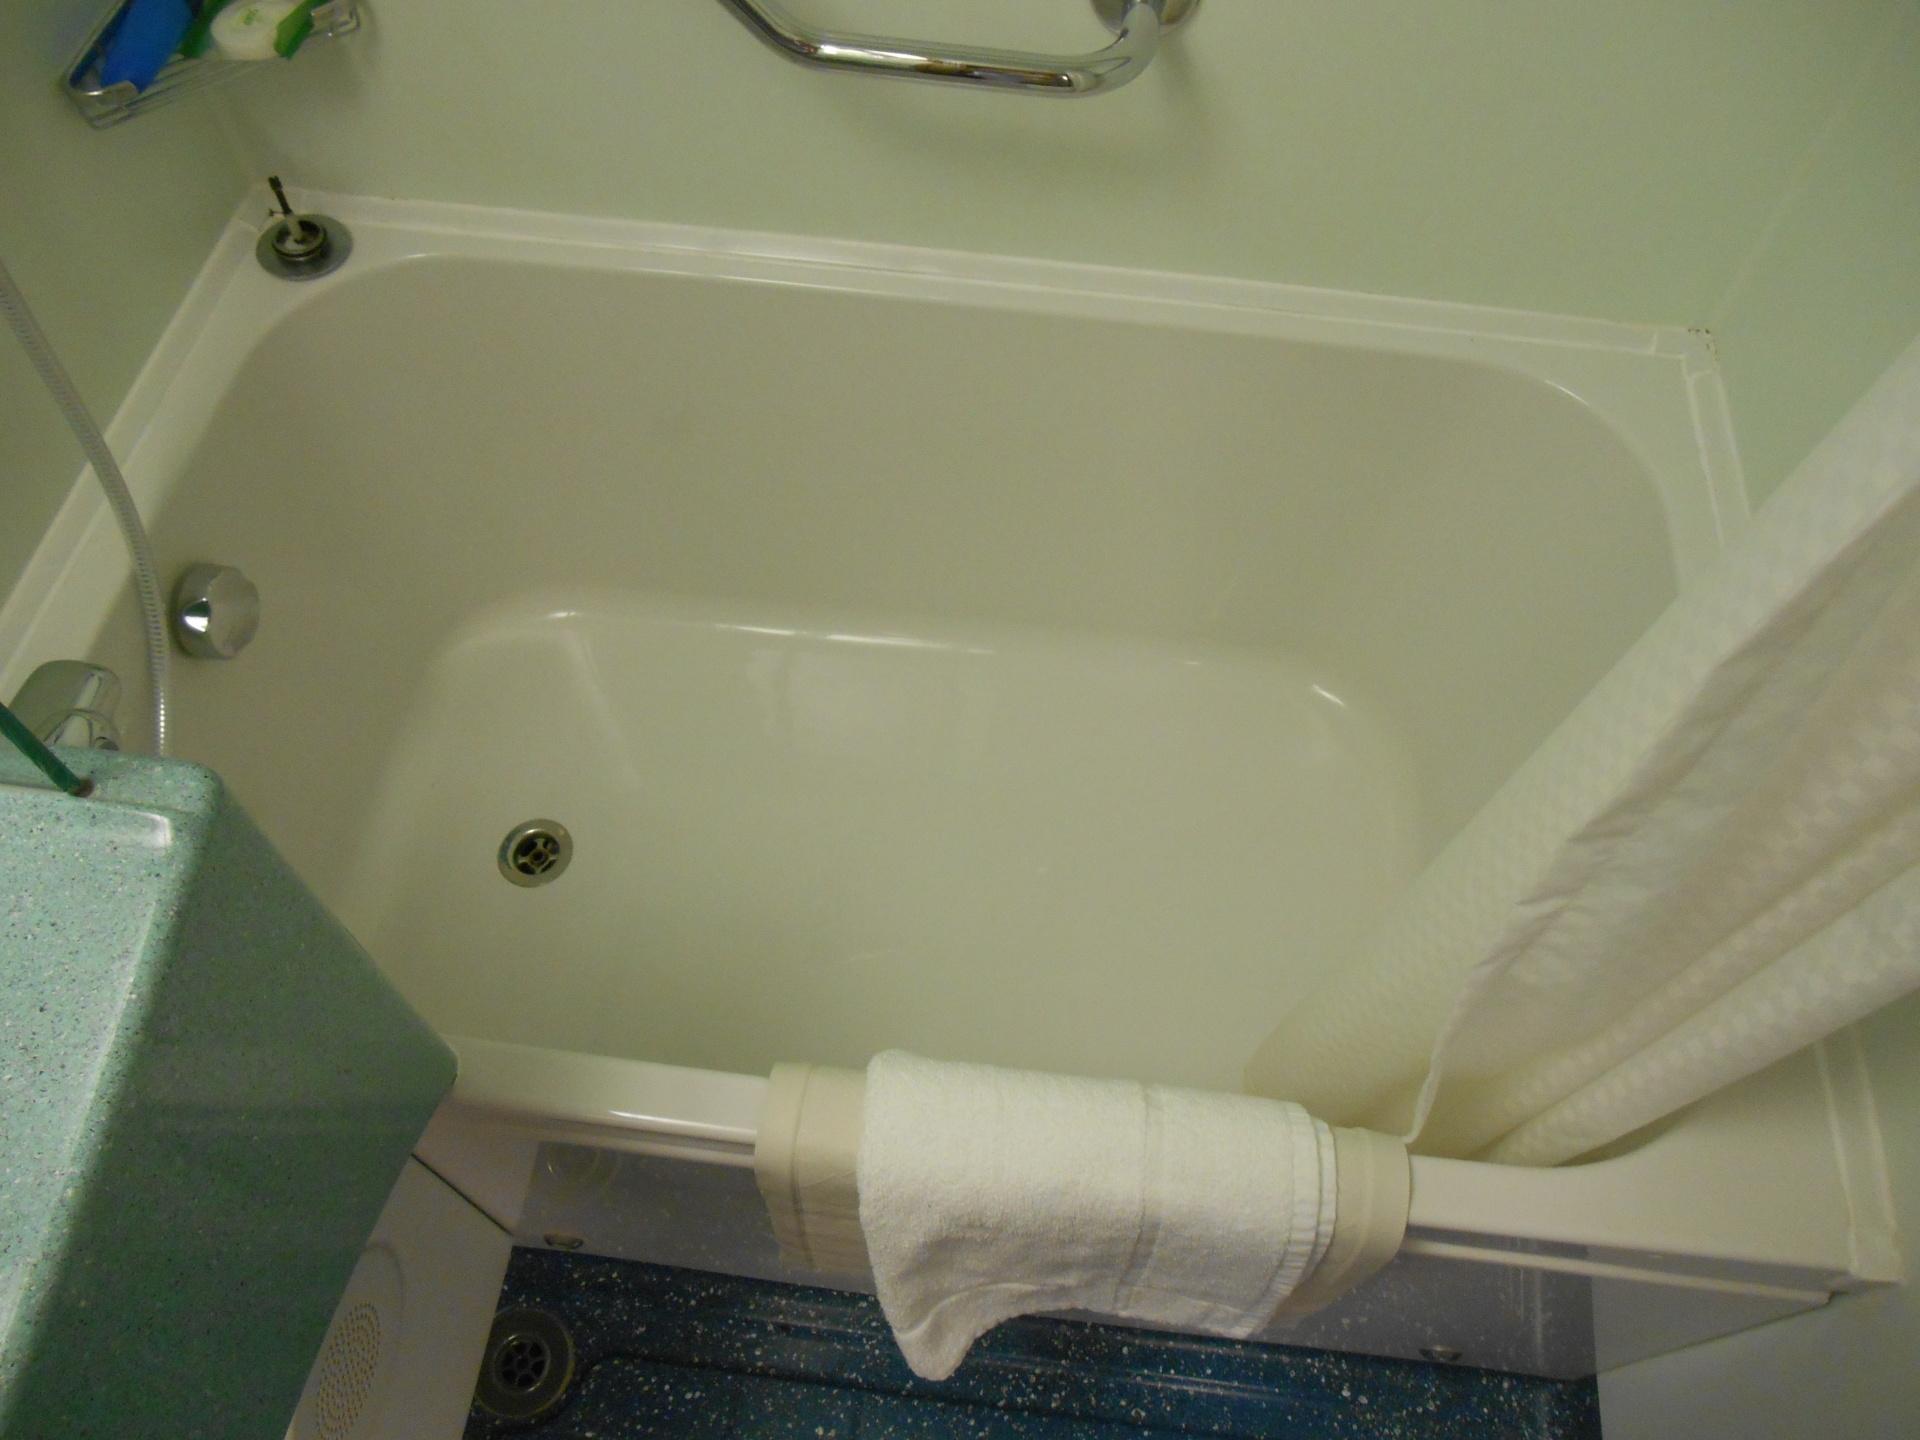 Carnival Magic bathtub